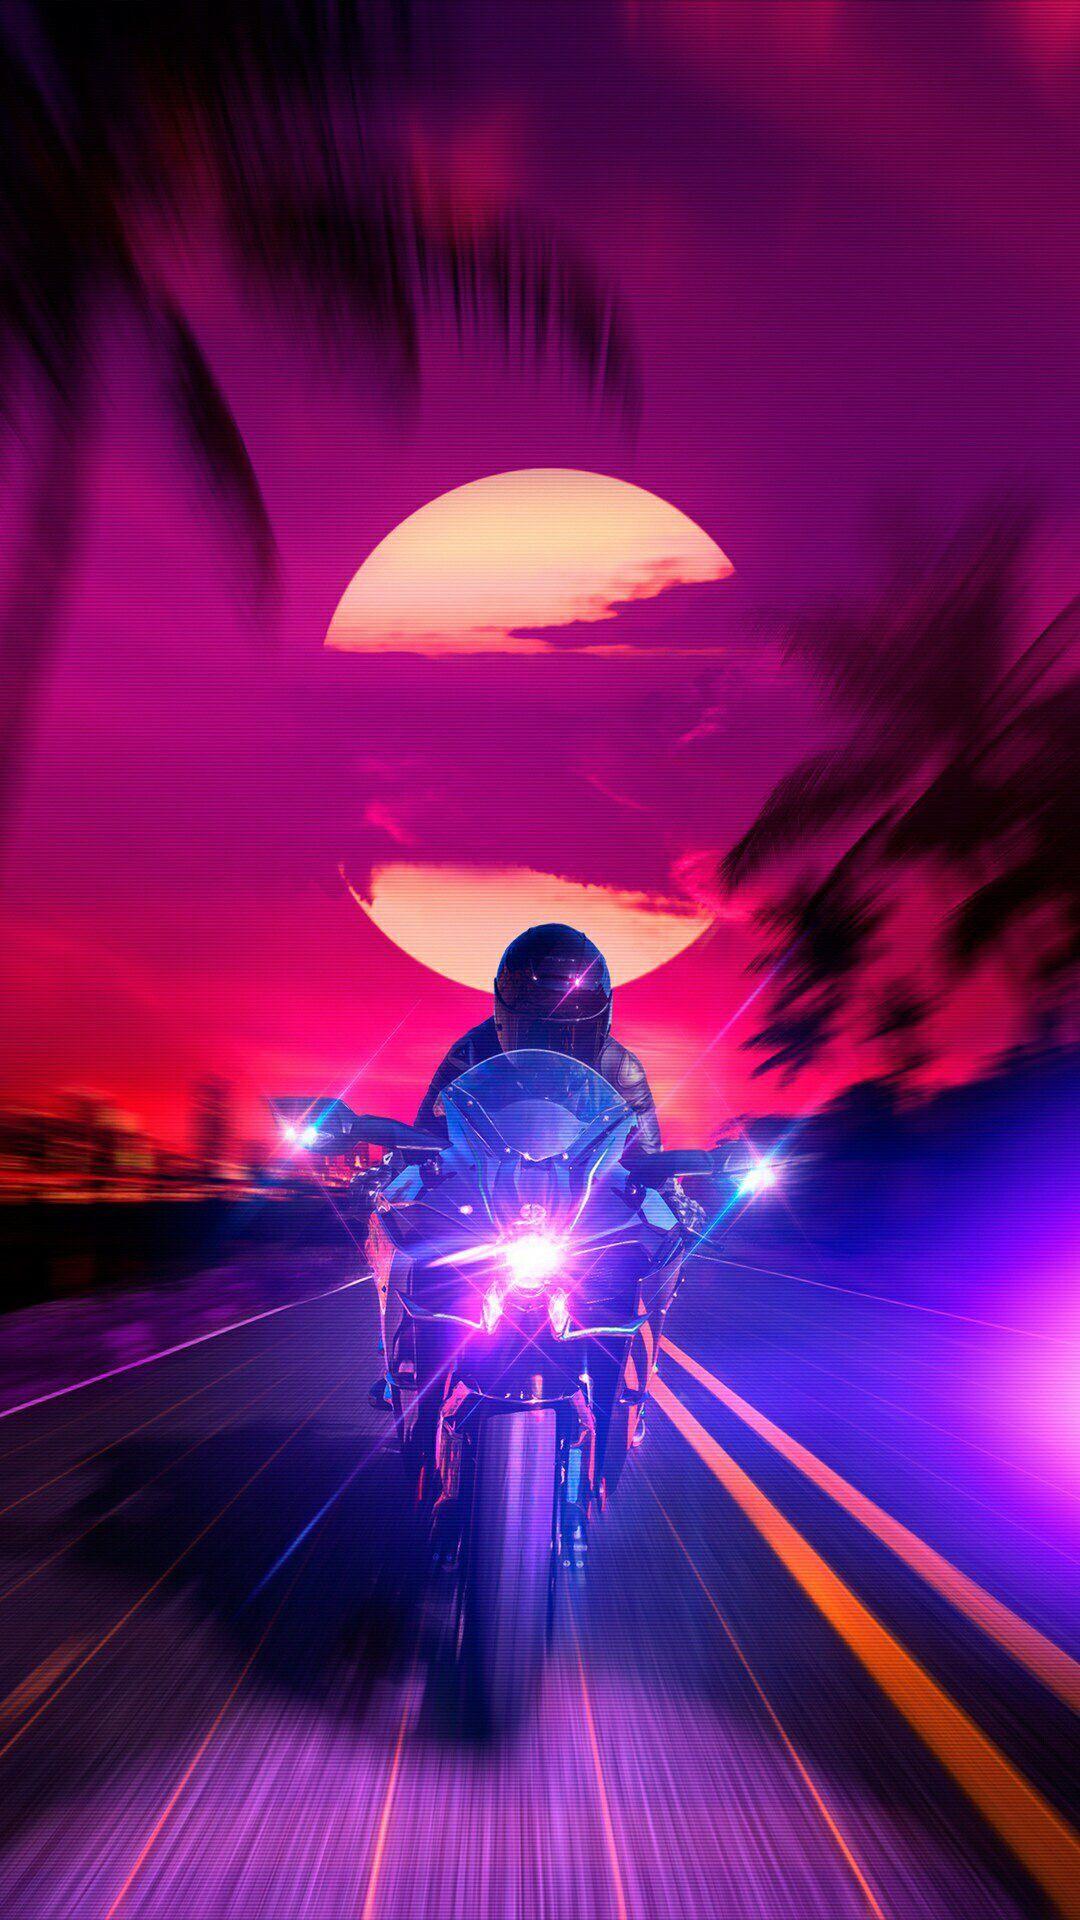 #bike #sunset | Synthwave art, Neon wallpaper, Retro futurism